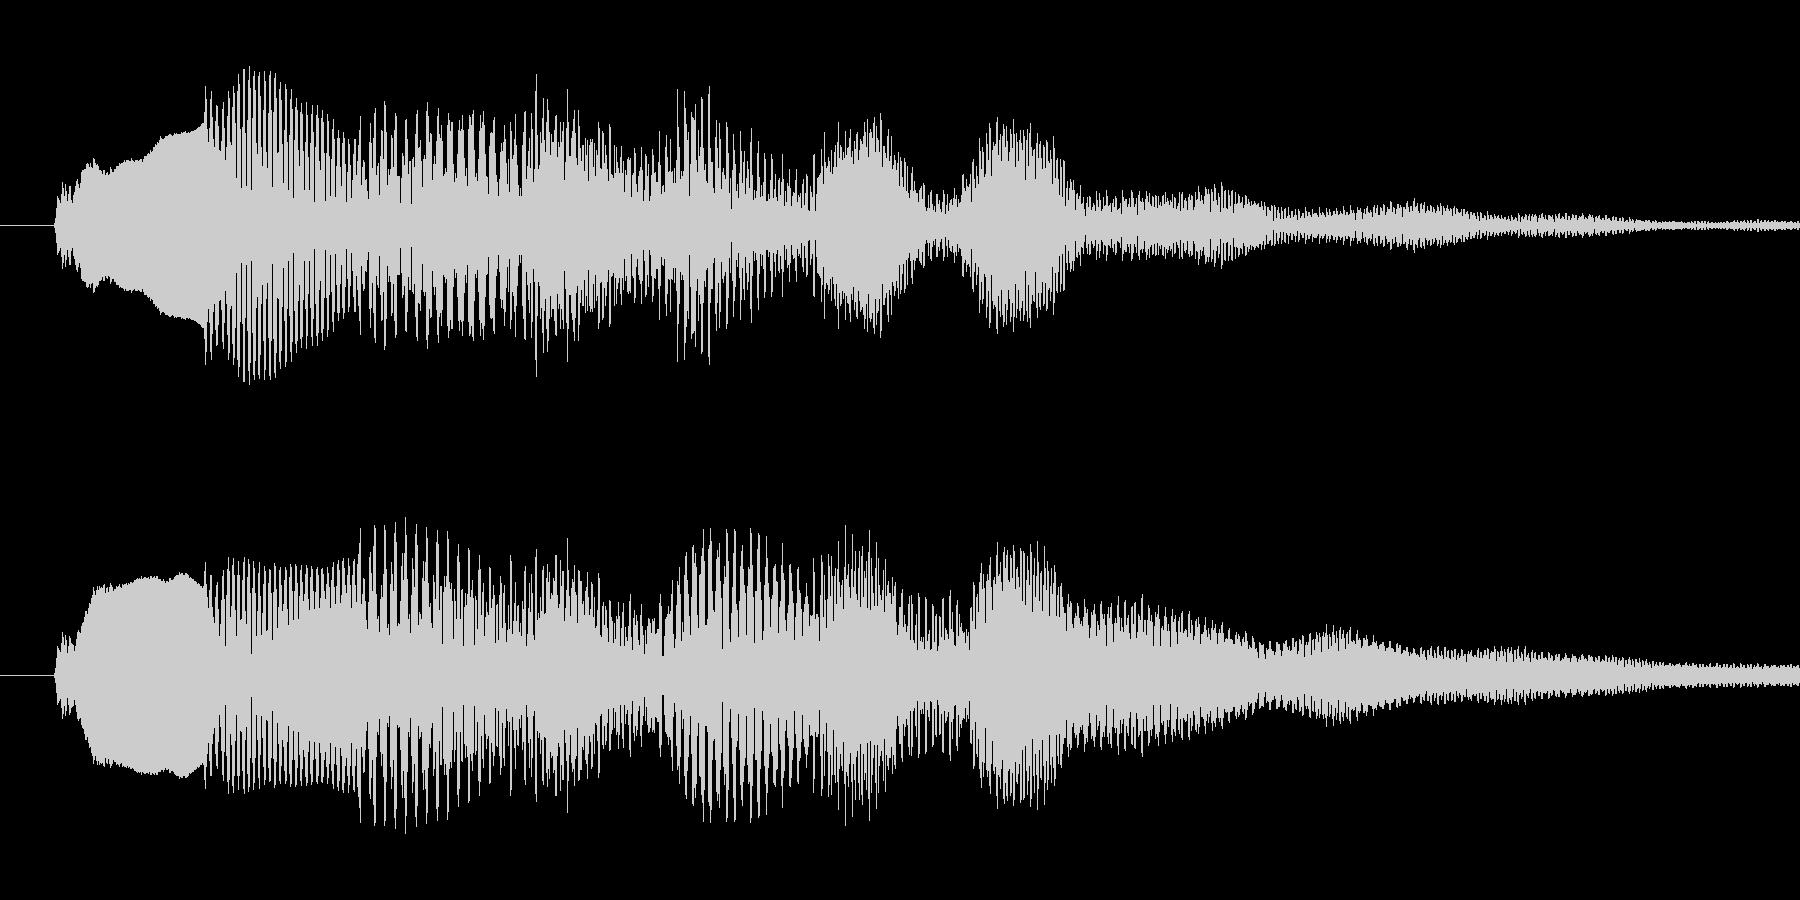 Musicboxによる着信音です。の未再生の波形